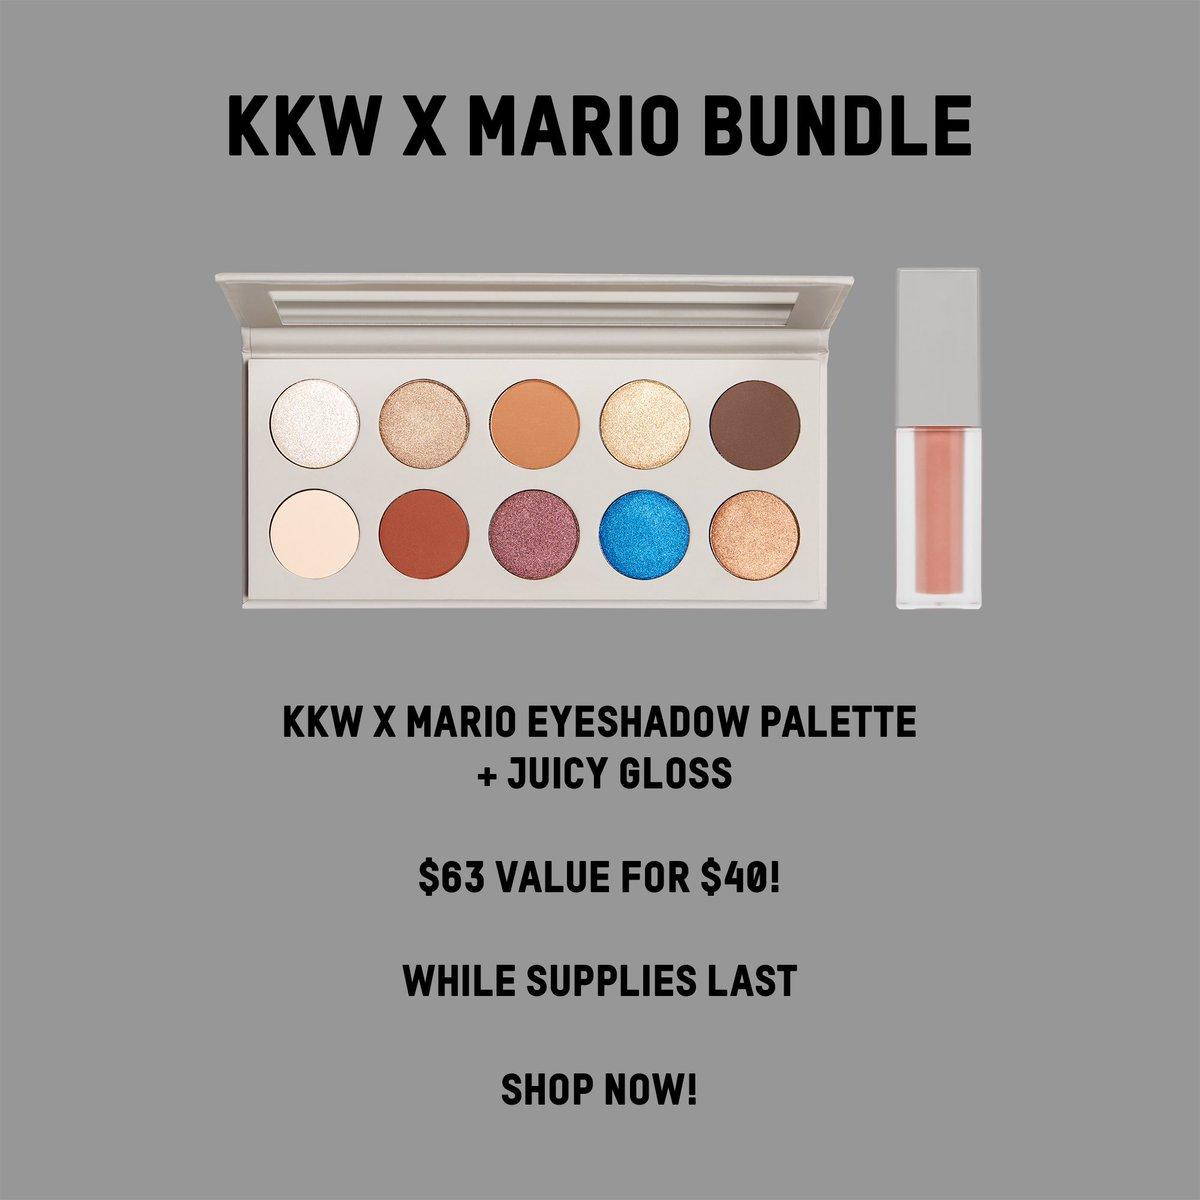 Shop my #kkwxmario eyeshadow palette & juicy gloss for $40 at https://t.co/aIjp1MBlpZ✨ I love this bundle!!! https://t.co/ULpKLzV6vM